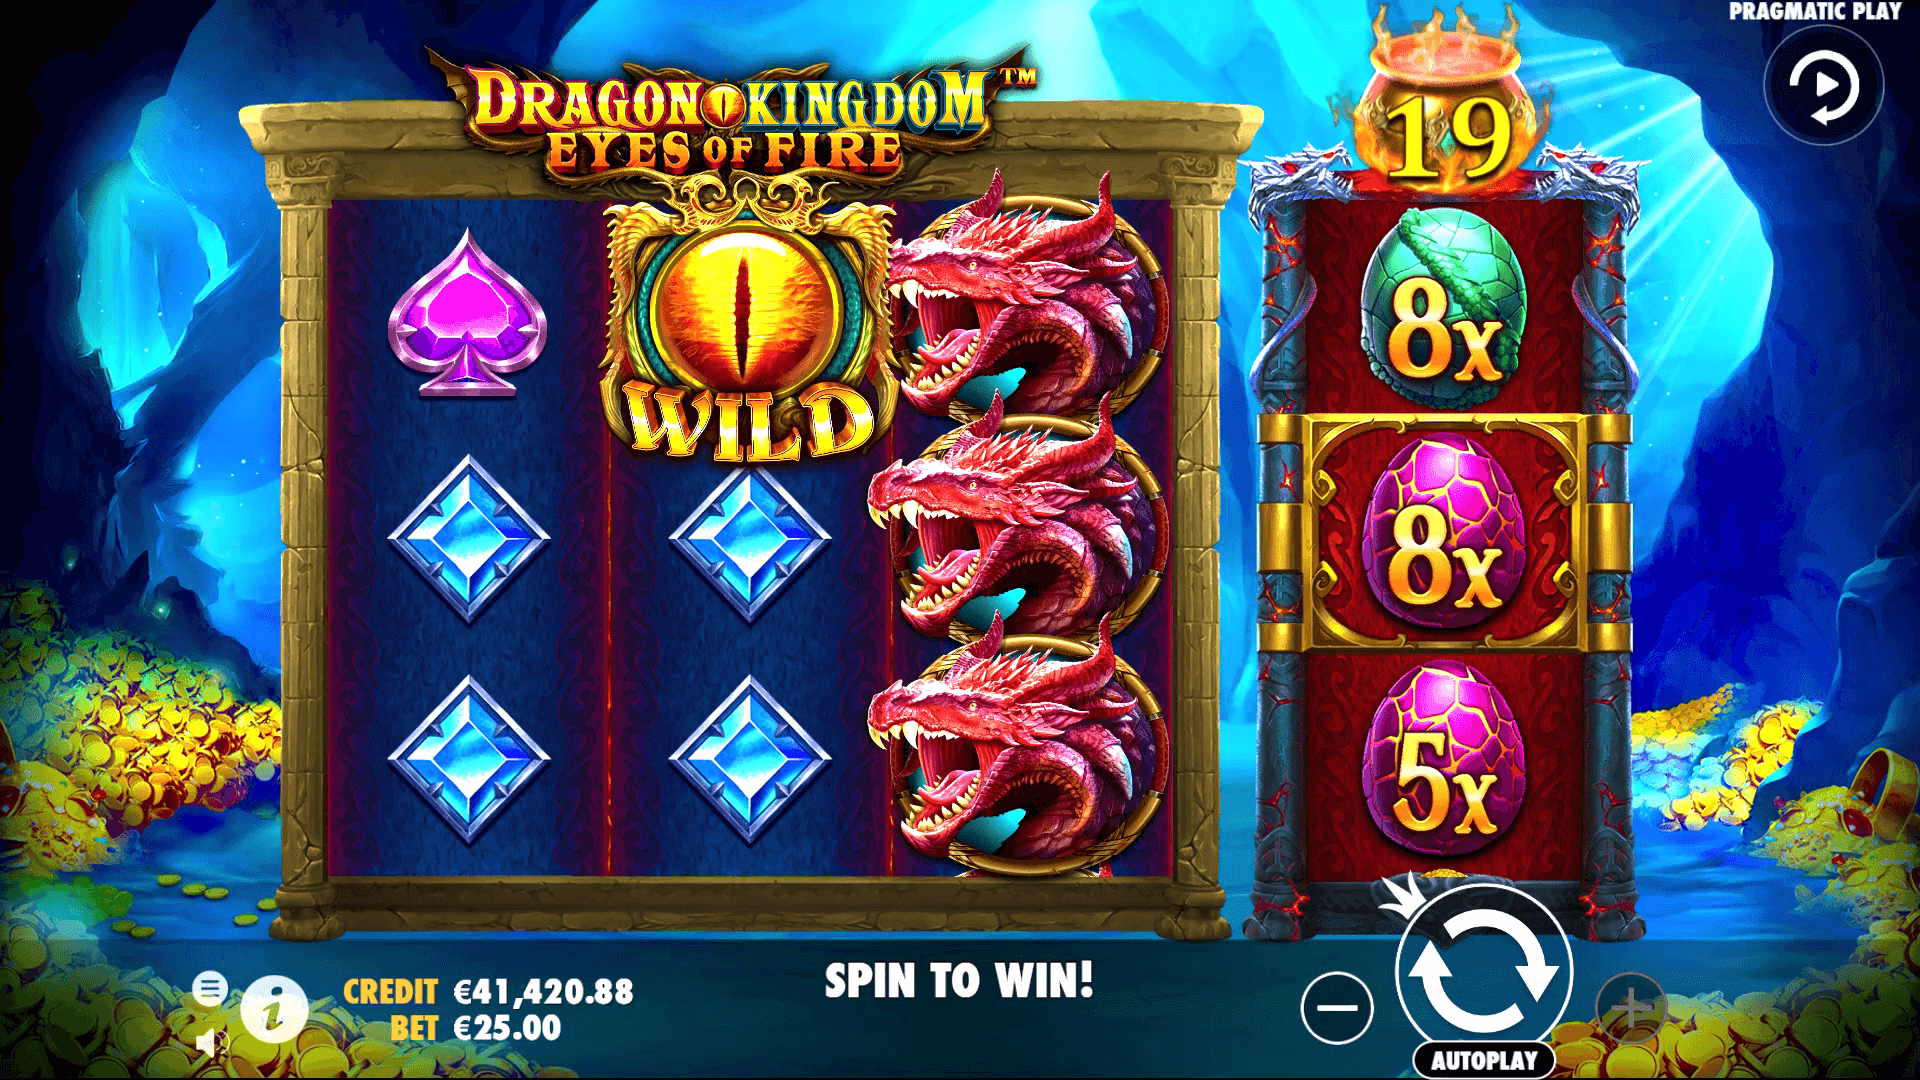 Dragon Kingdom Eyes of Fire - Pragmatic Play desktop